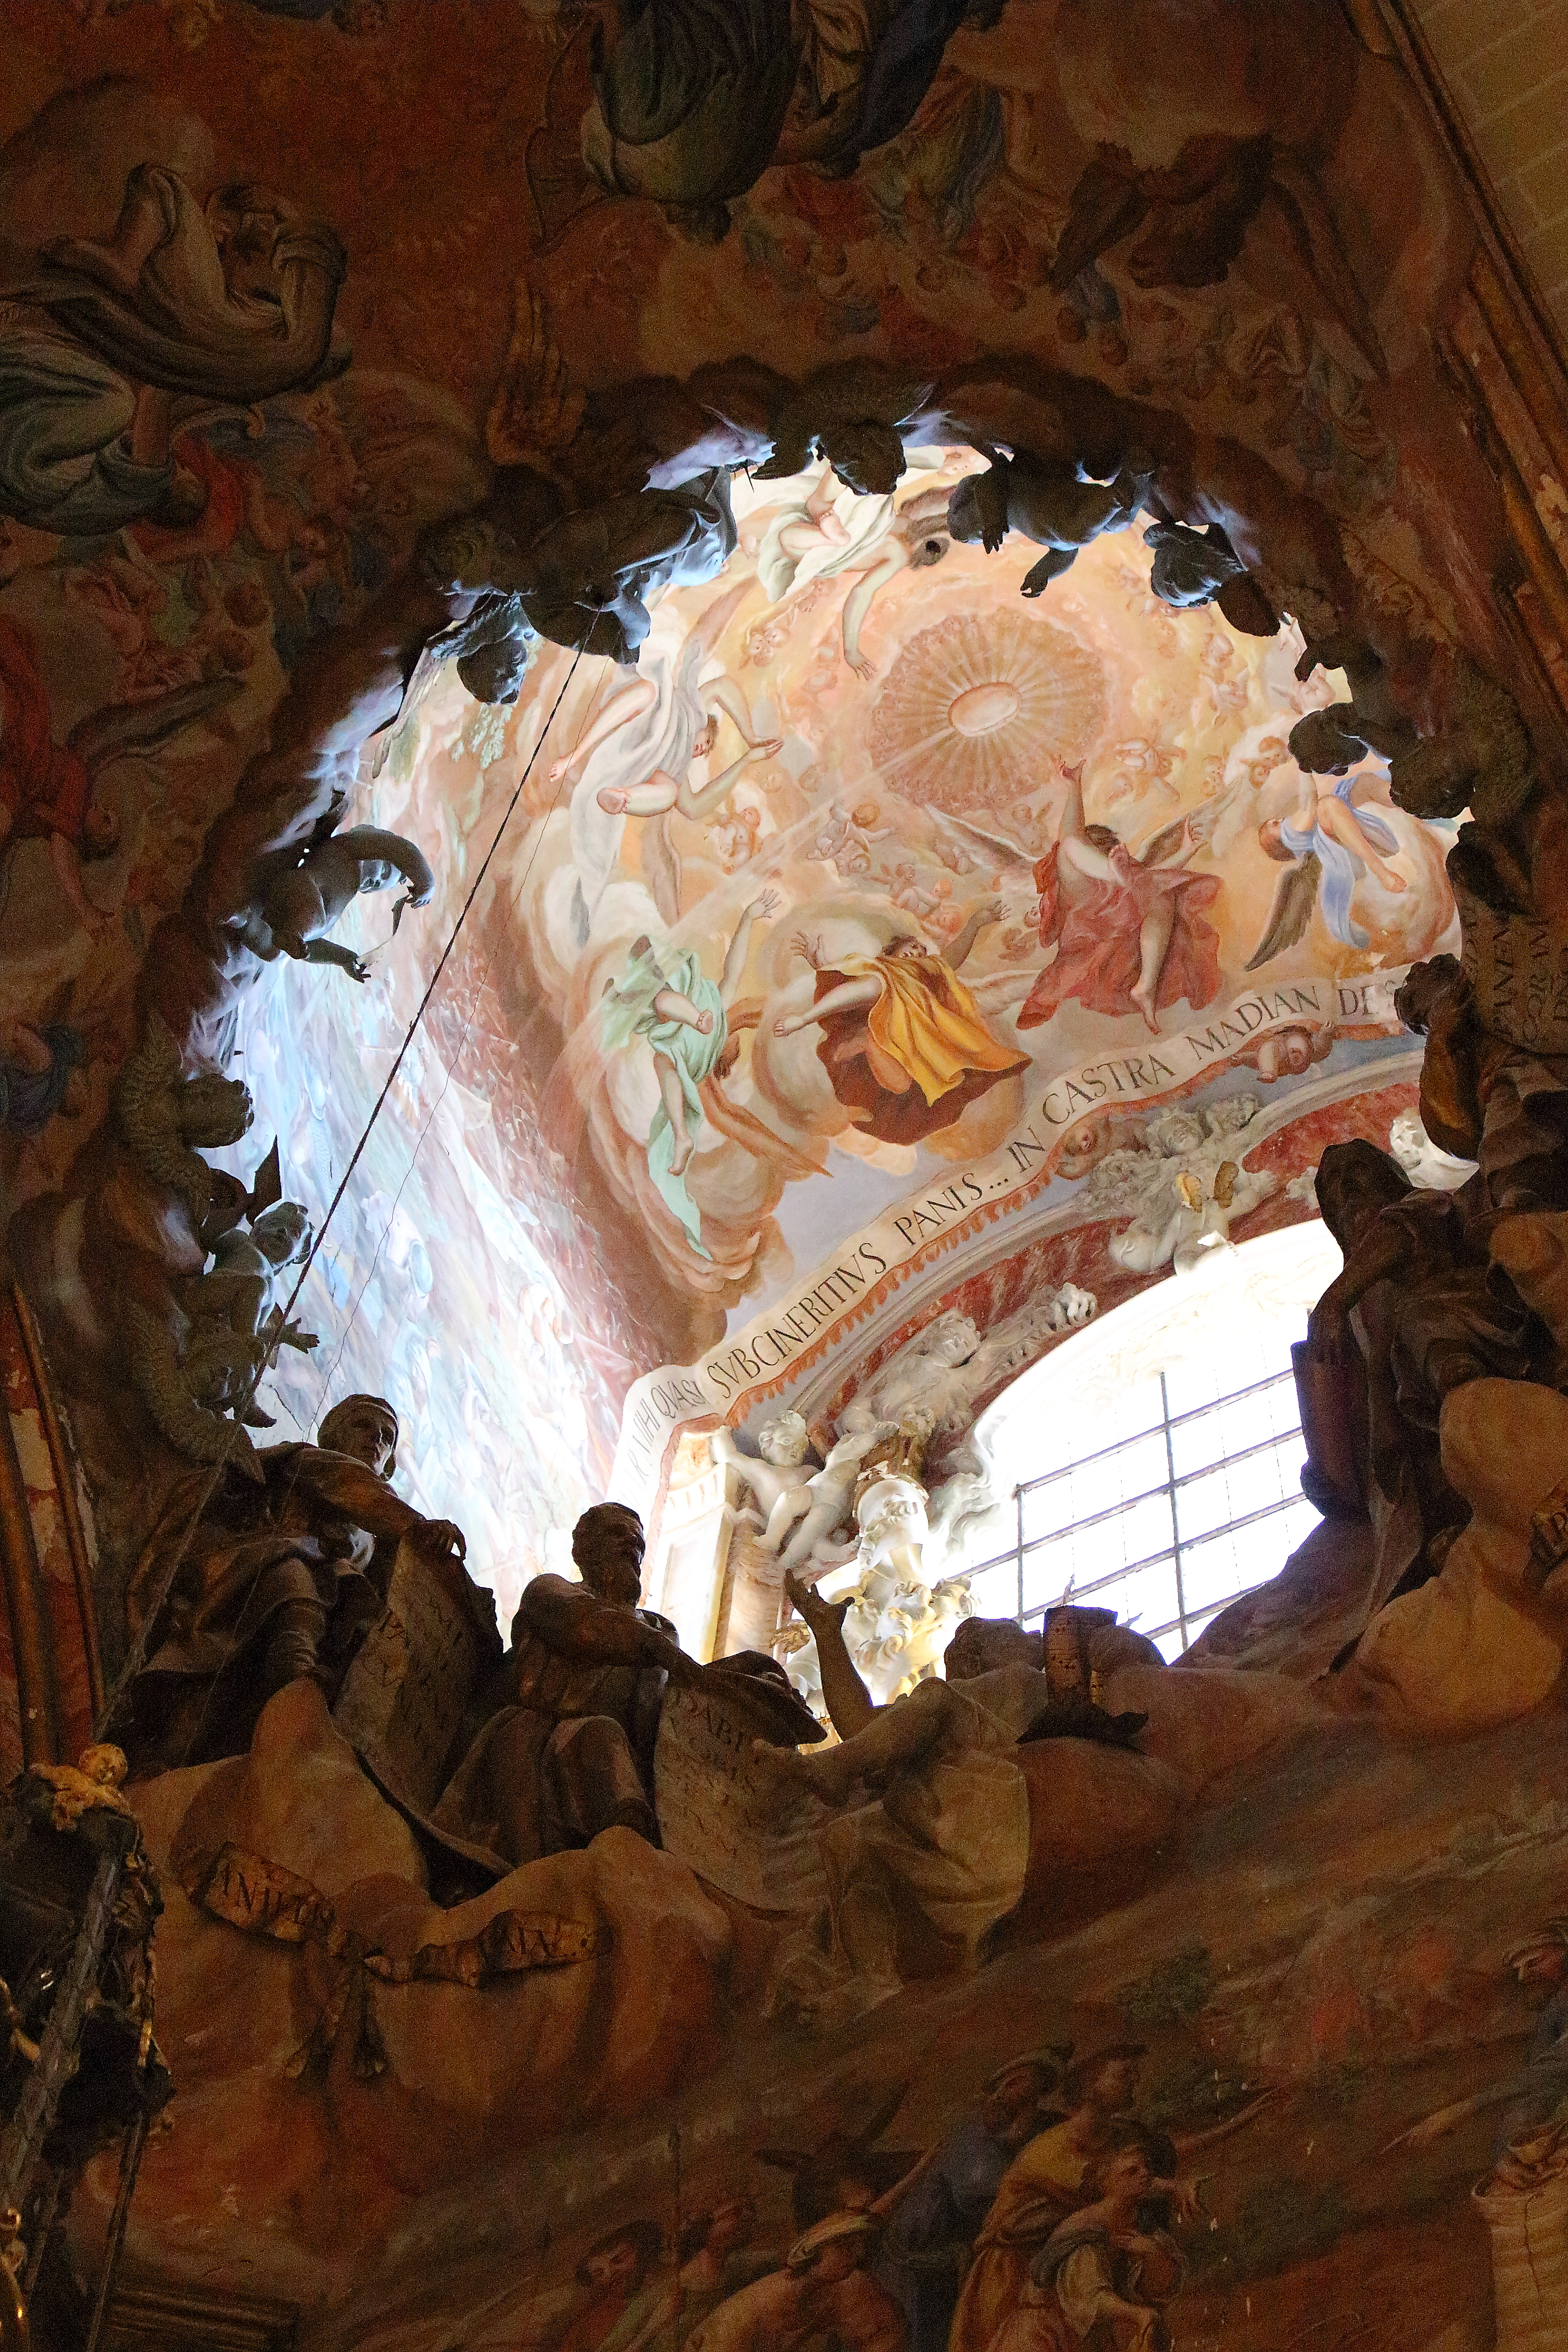 El trasparente - opera scultorea in marmo e alabastro